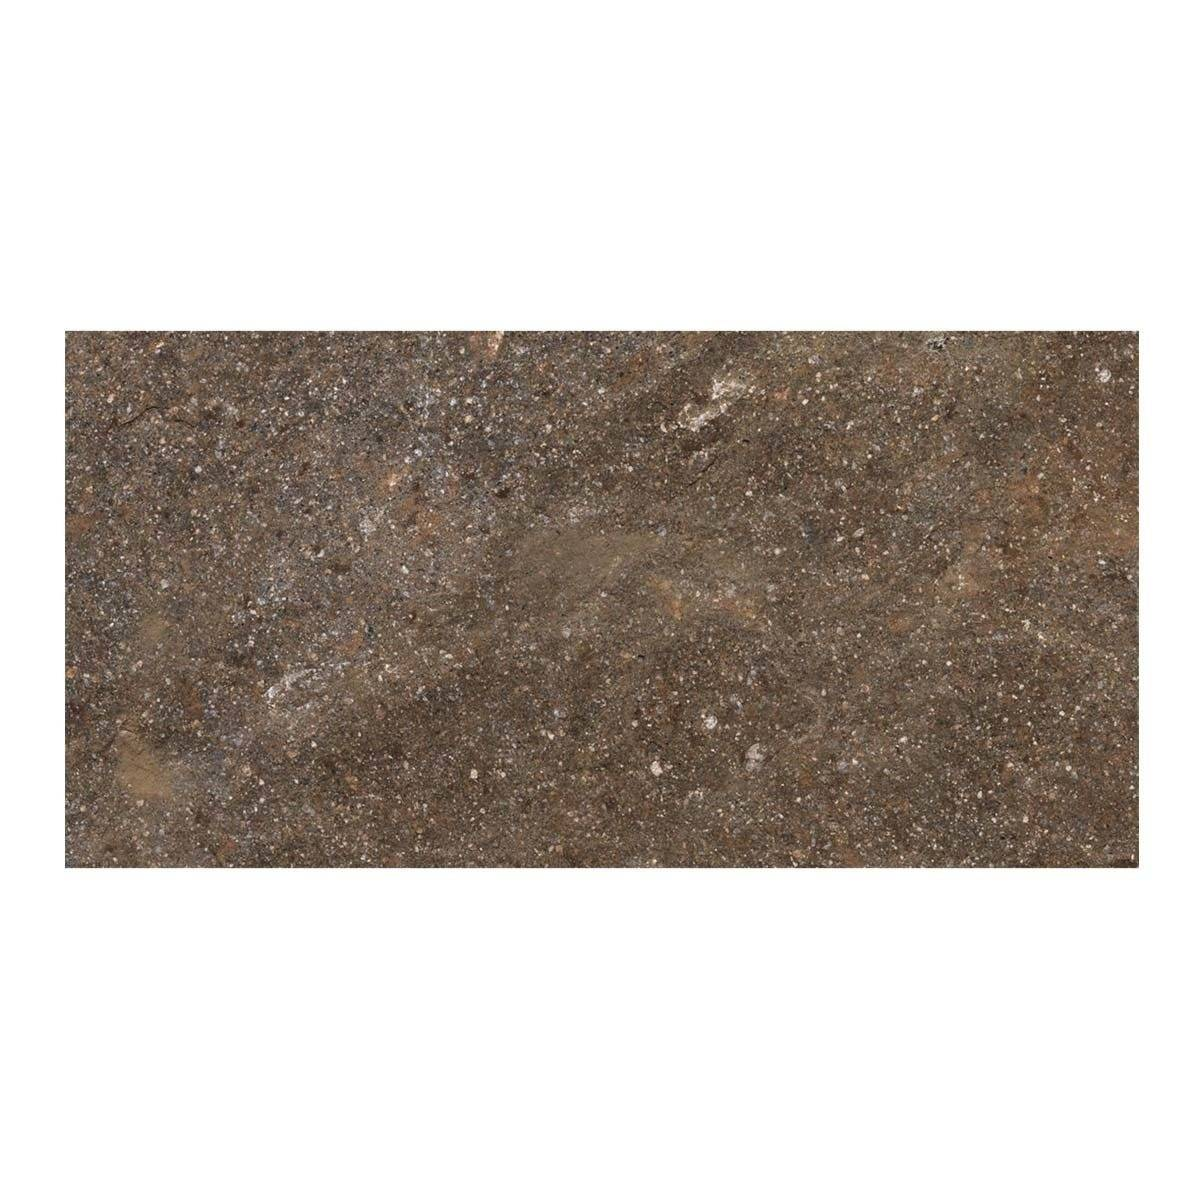 Pavimento Esterno Porfido Multicolor 20x40x0,85 Cm R10 Gres Porcellanato